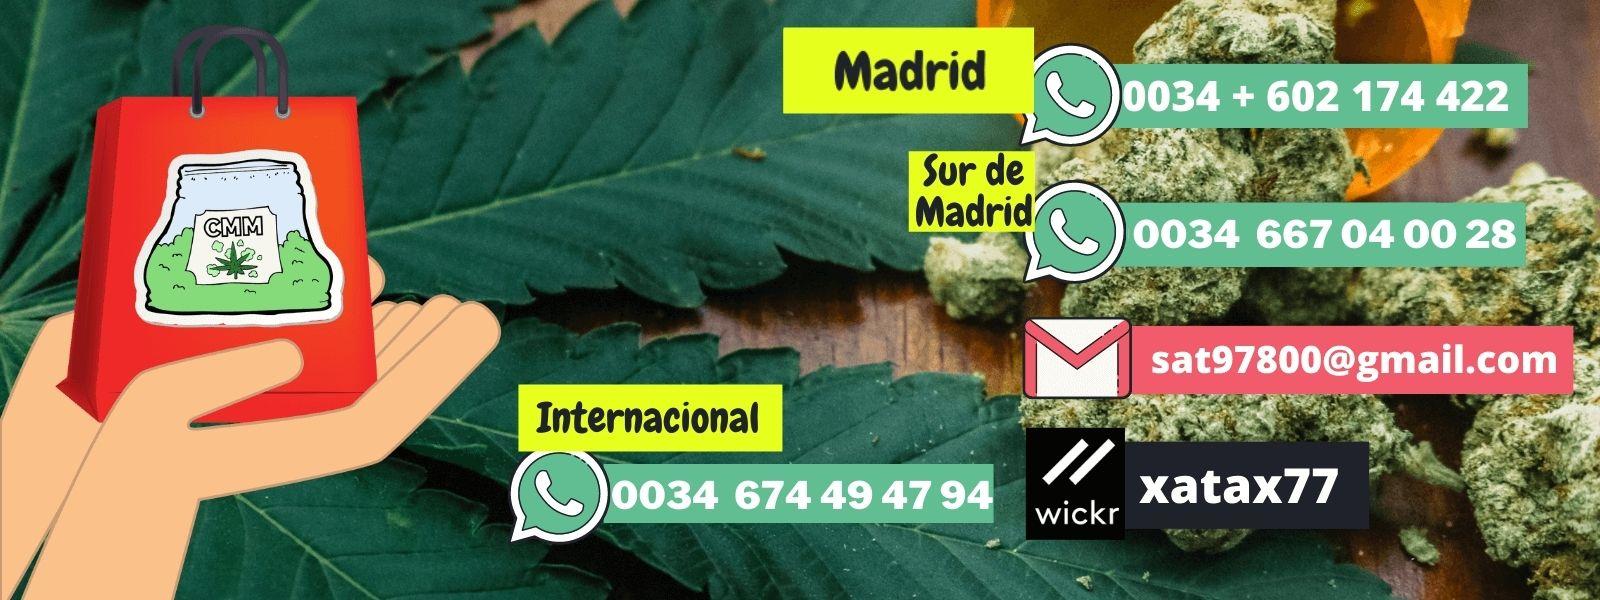 Comprarmarihuanamadrid.com – 0034602174422 whatsapp sat97800@gmail.com WICKR XATAX77